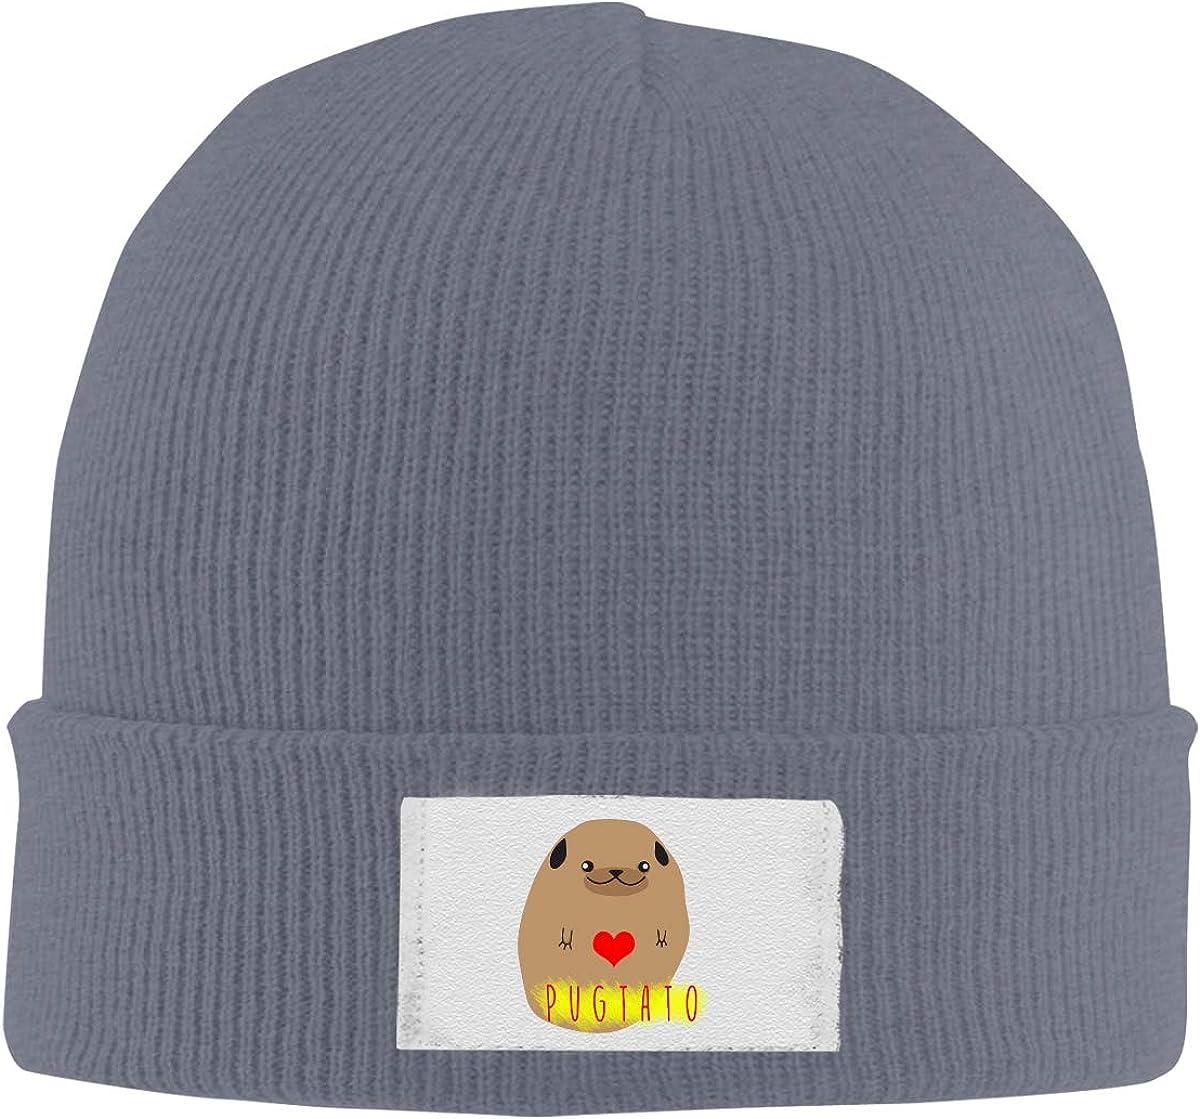 Skull Caps My Patronus is an Unicorn Winter Warm Knit Hats Stretchy Cuff Beanie Hat Black